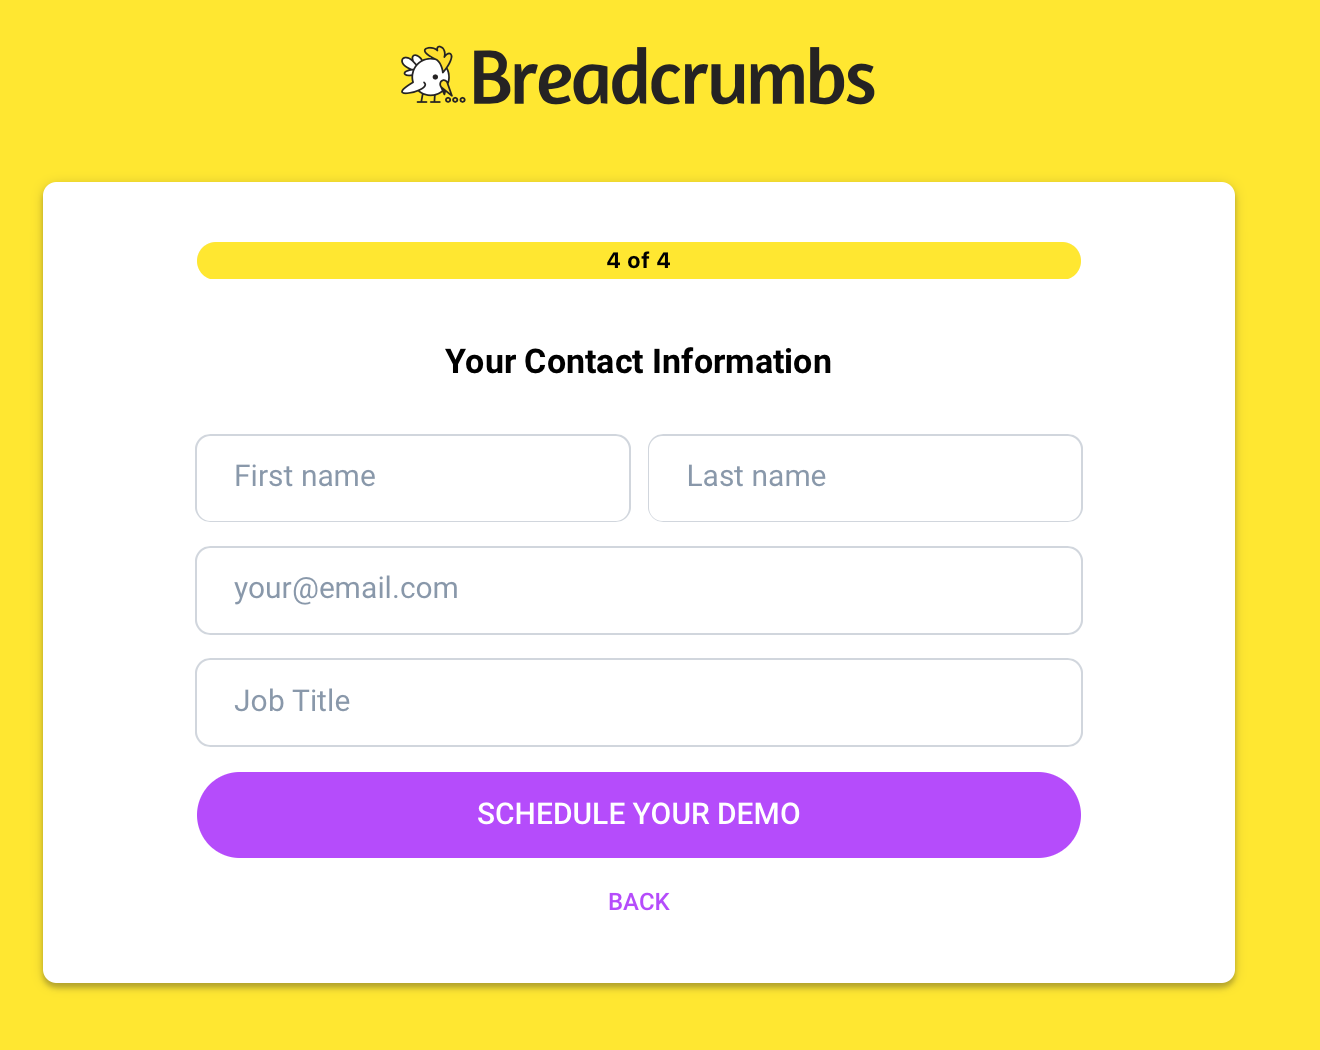 Breadcrumbs contact form.